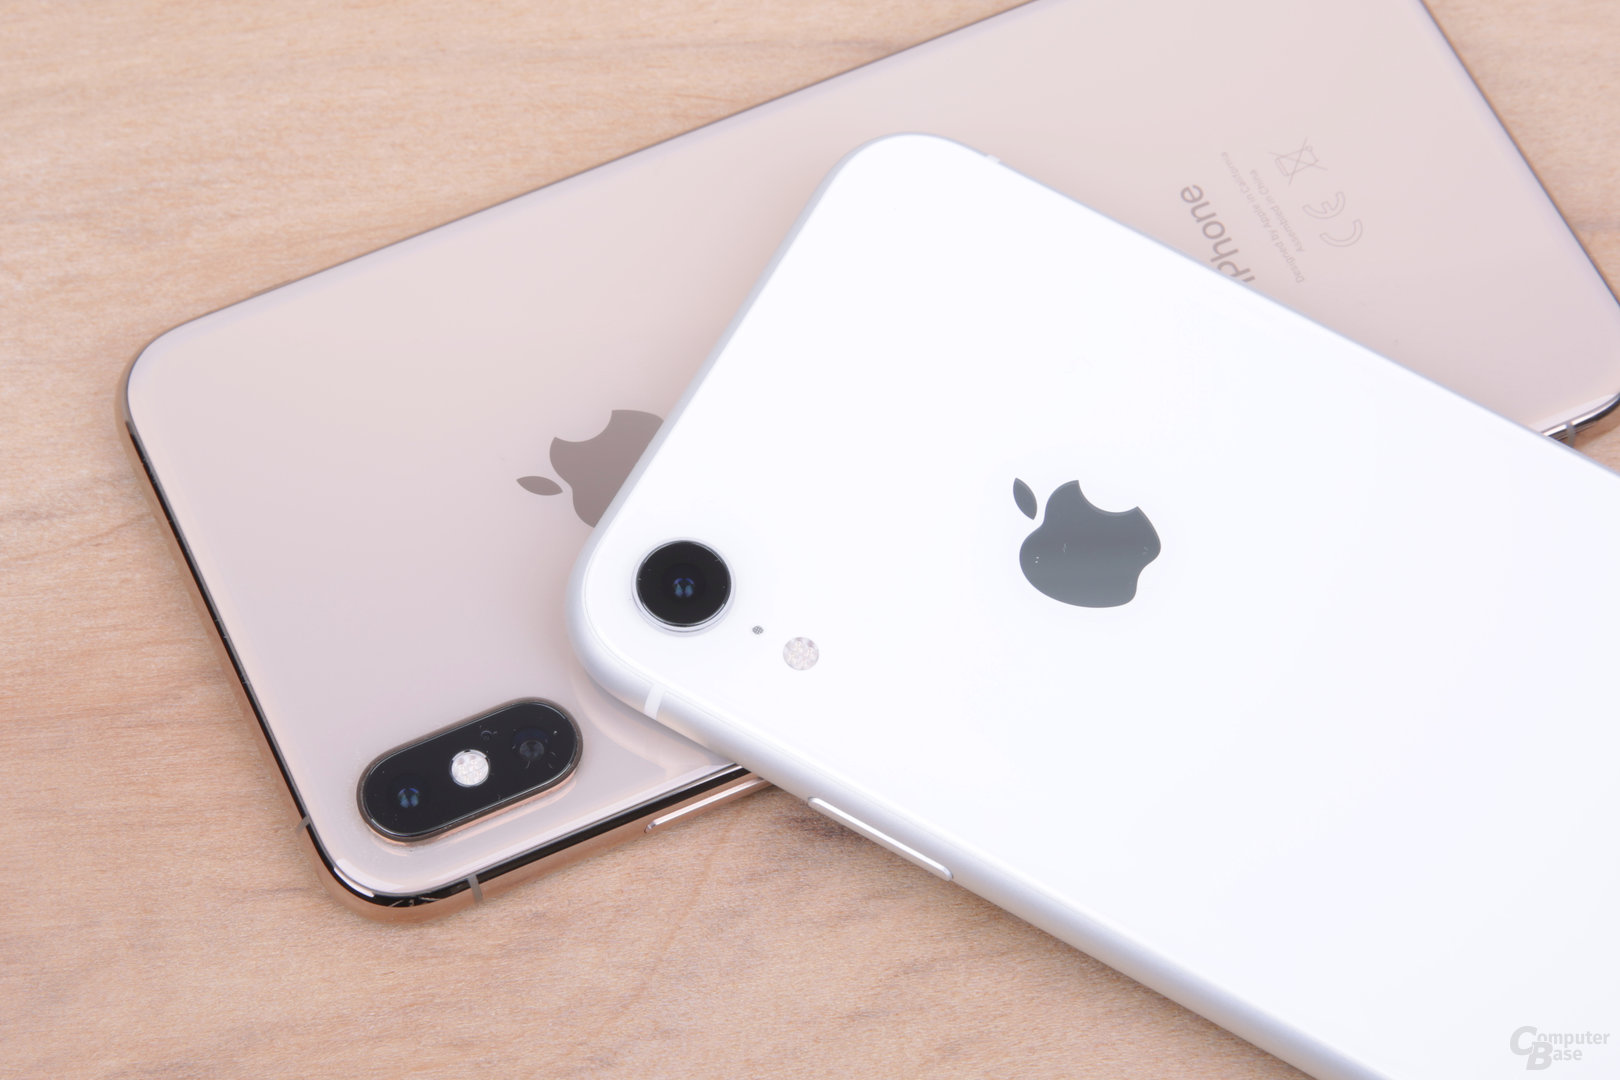 Single-Kamera mit der Hauptkamera des iPhone Xs (Max)